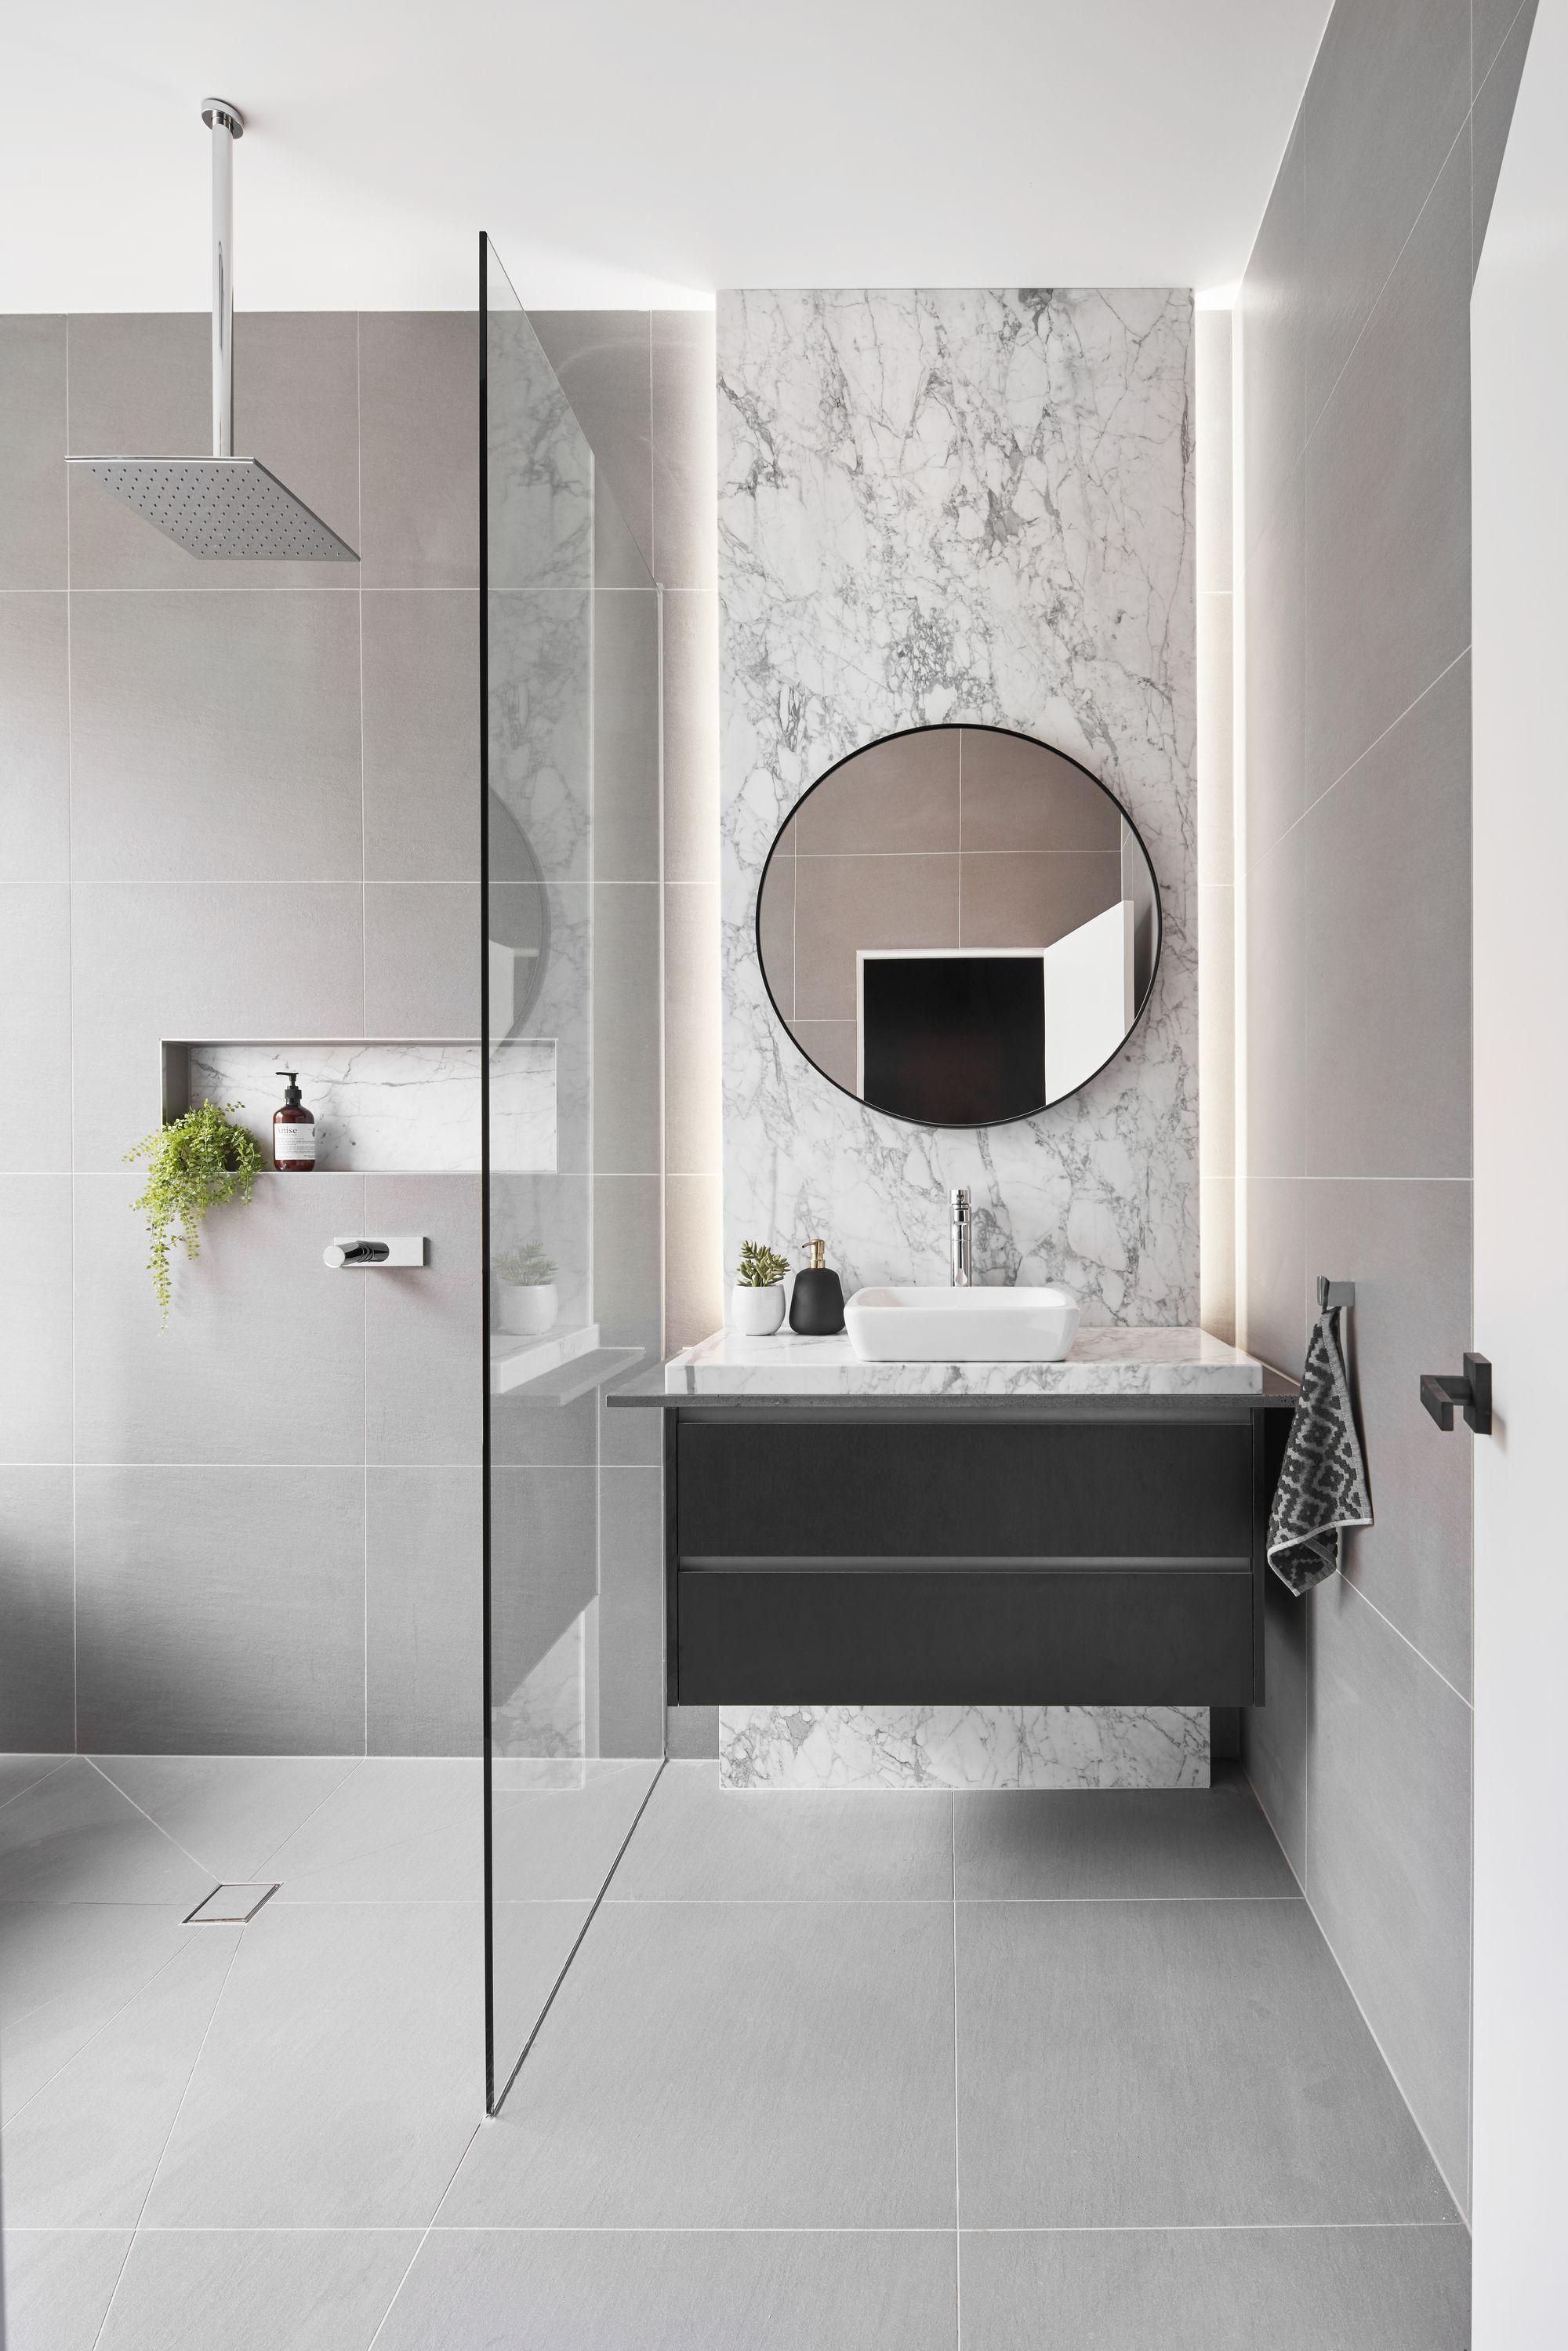 Home Renovation Special Bathroom Lighting Fixture Bathroom Interior Design Modern Bathroom Design Bathroom Inspiration Modern